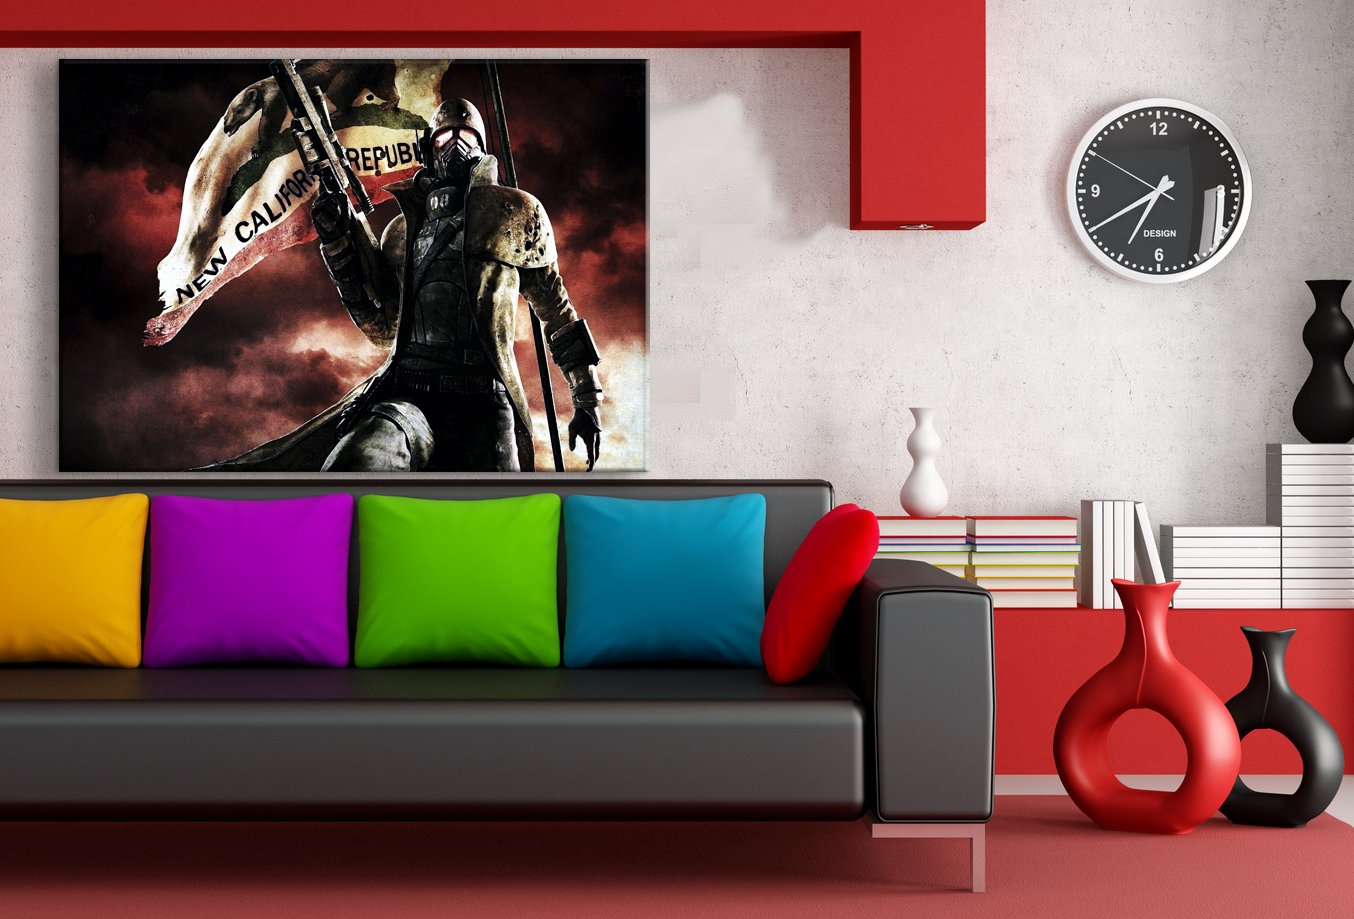 Fallout New Vegas Kämpfer Leinwandbild LaraArt Studio Wanddeko Wandbild 100 100 100 x 70 cm f1320d